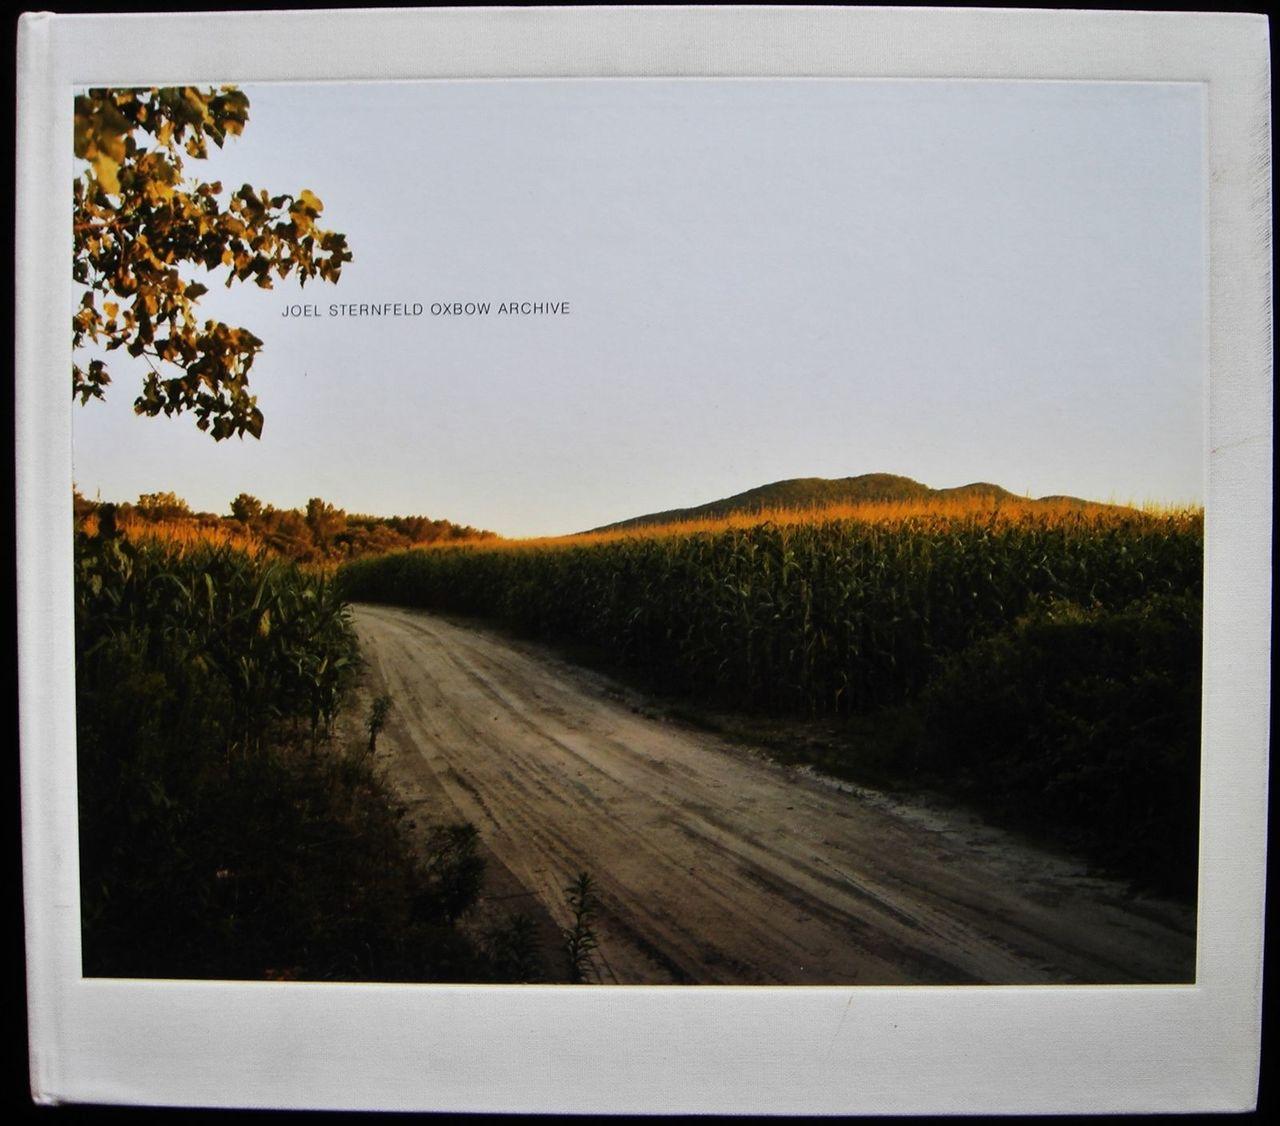 JOEL STERNFELD: OXBOW ARCHIVE 2008 Artist Signed Brilliant CT Landscape Photos